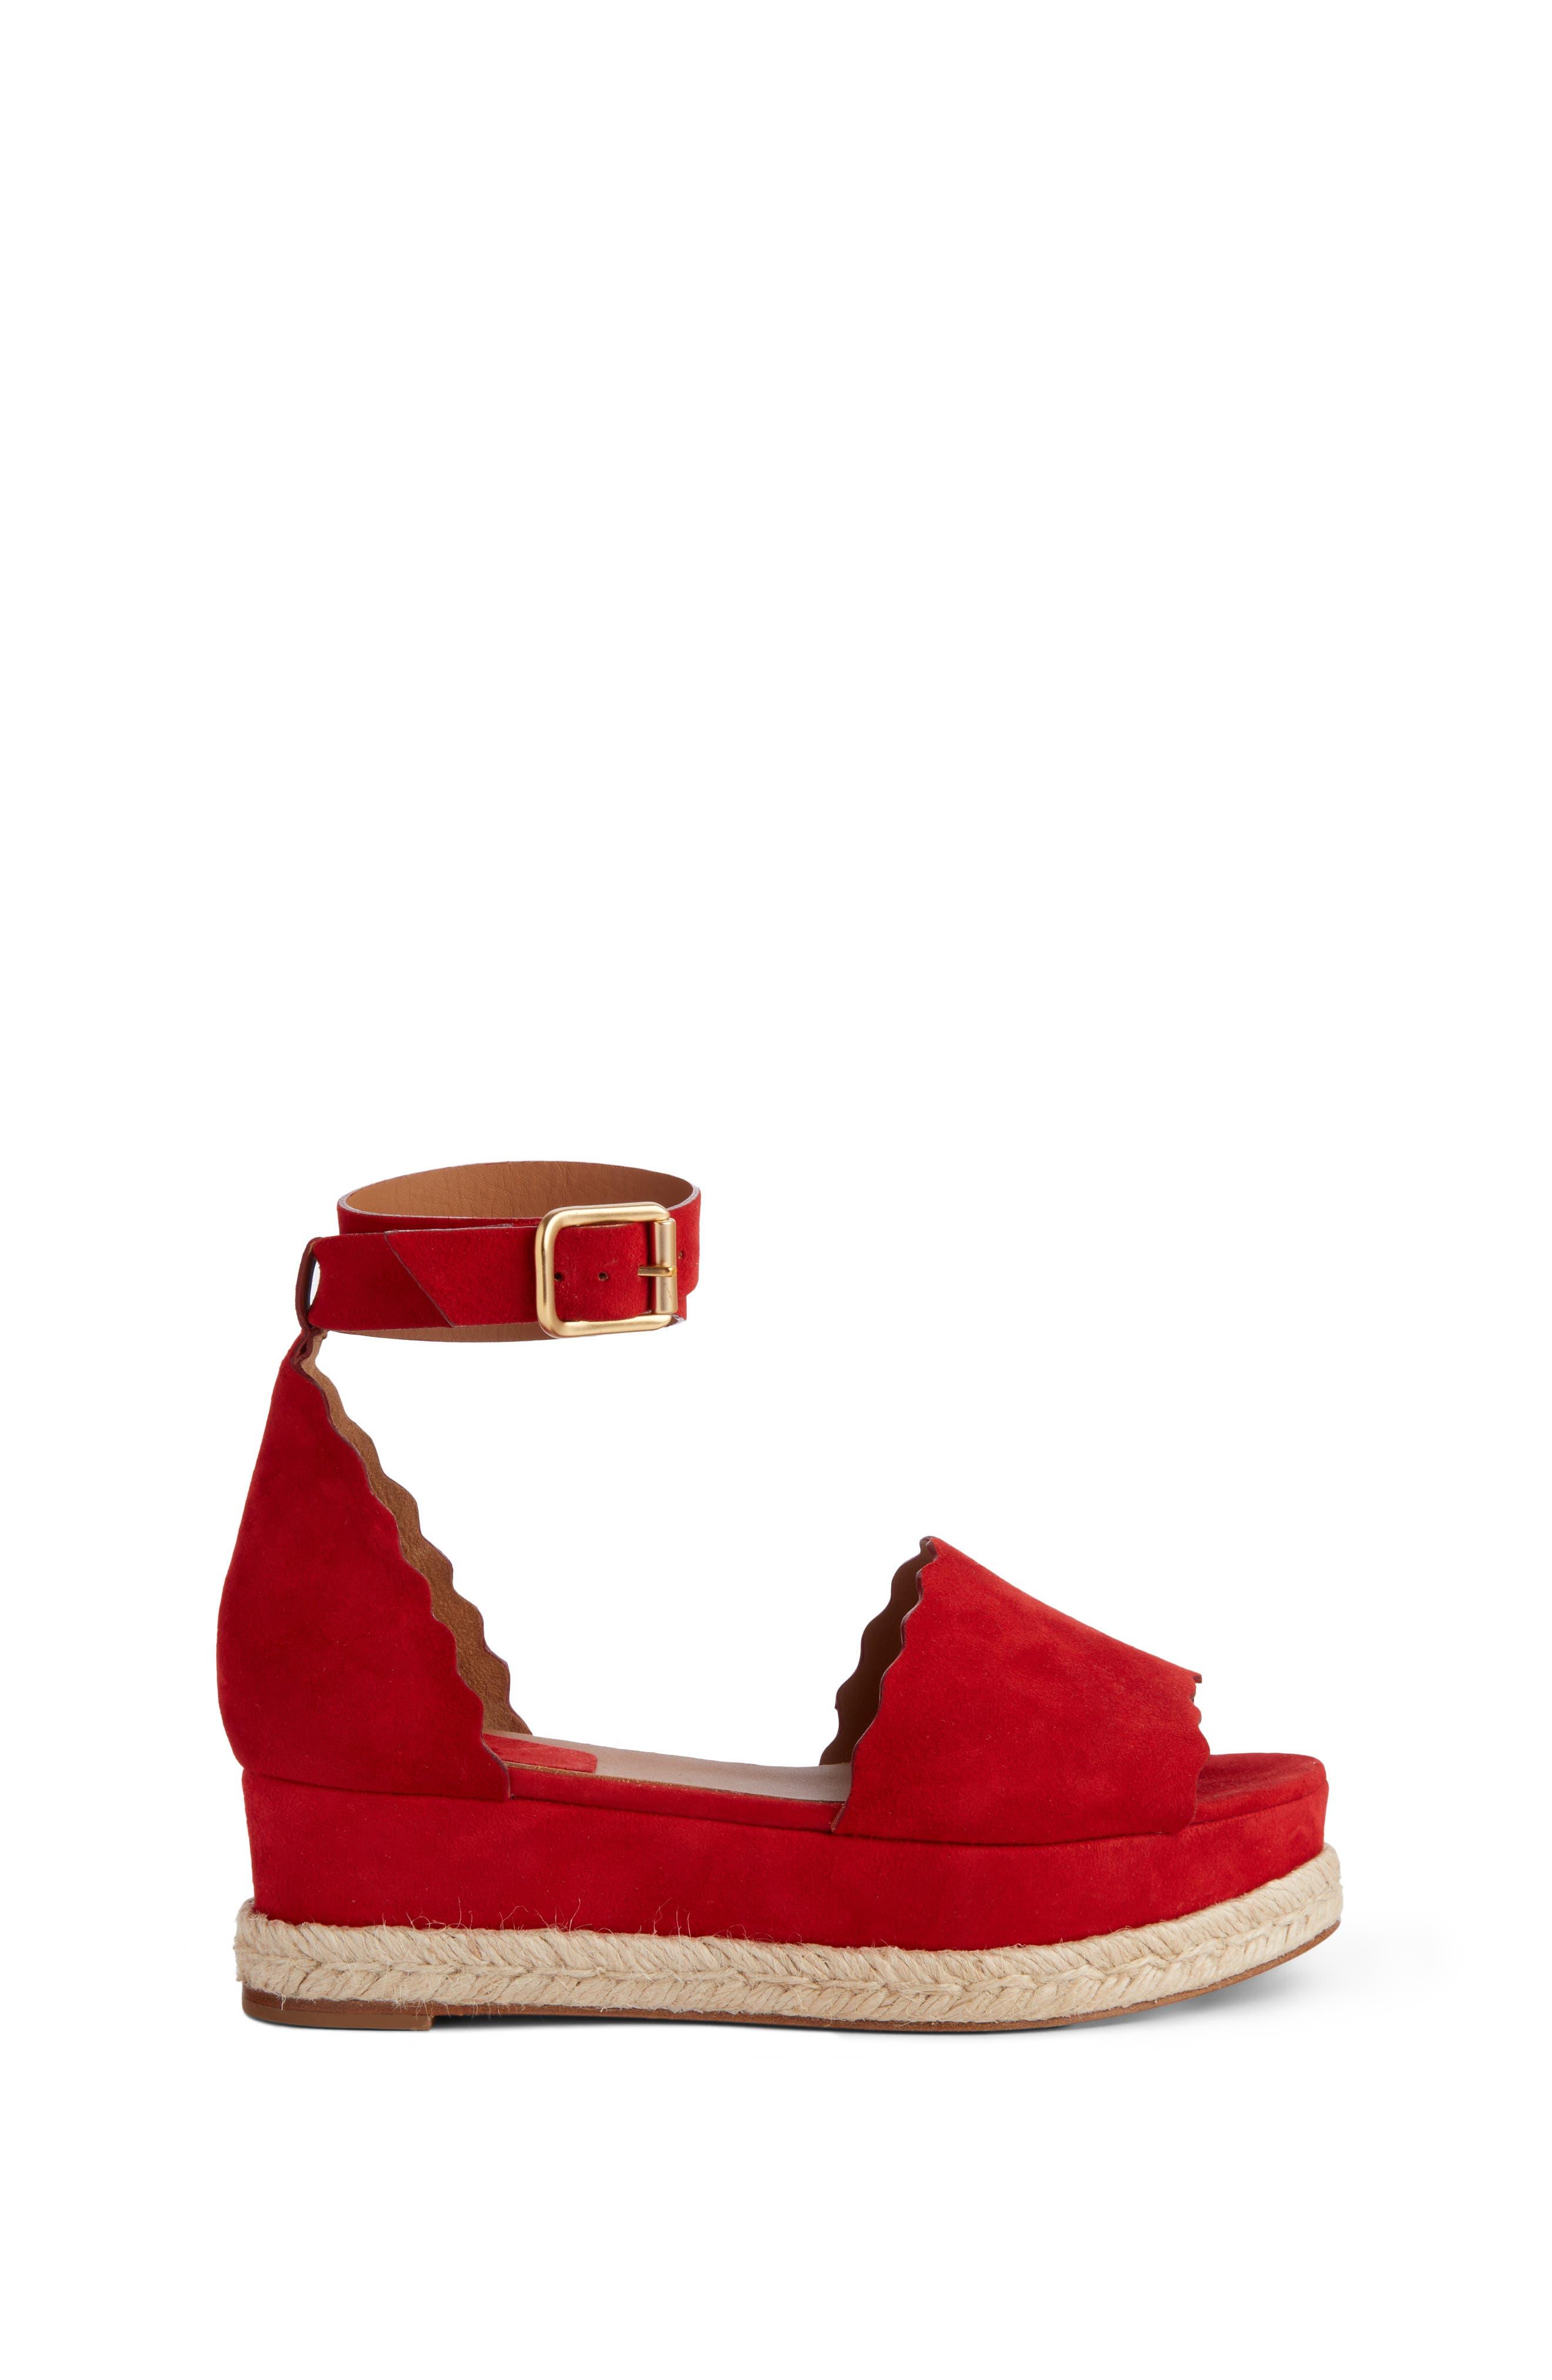 Lauren Espadrille Wedge Sandal,                             Alternate thumbnail 3, color,                             Red Flame